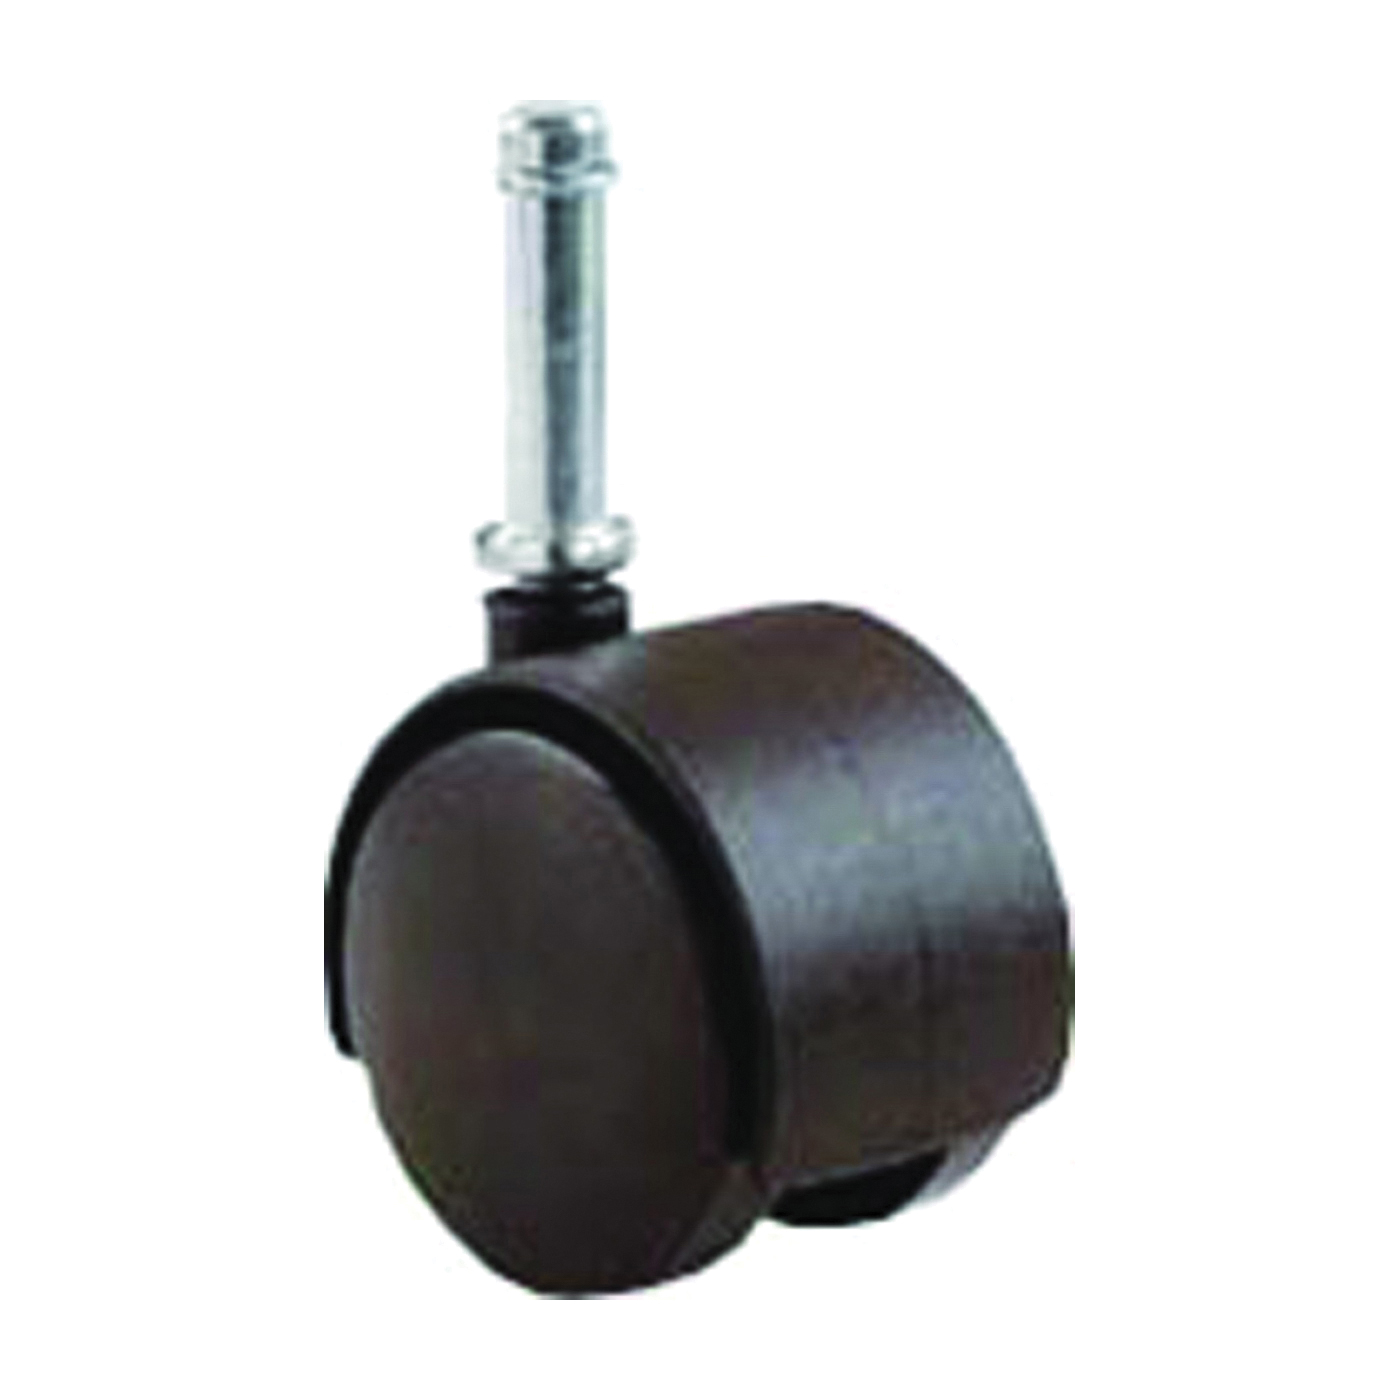 Picture of Shepherd Hardware 9673 Swivel Caster, 2 in Dia Wheel, Black, 75 lb